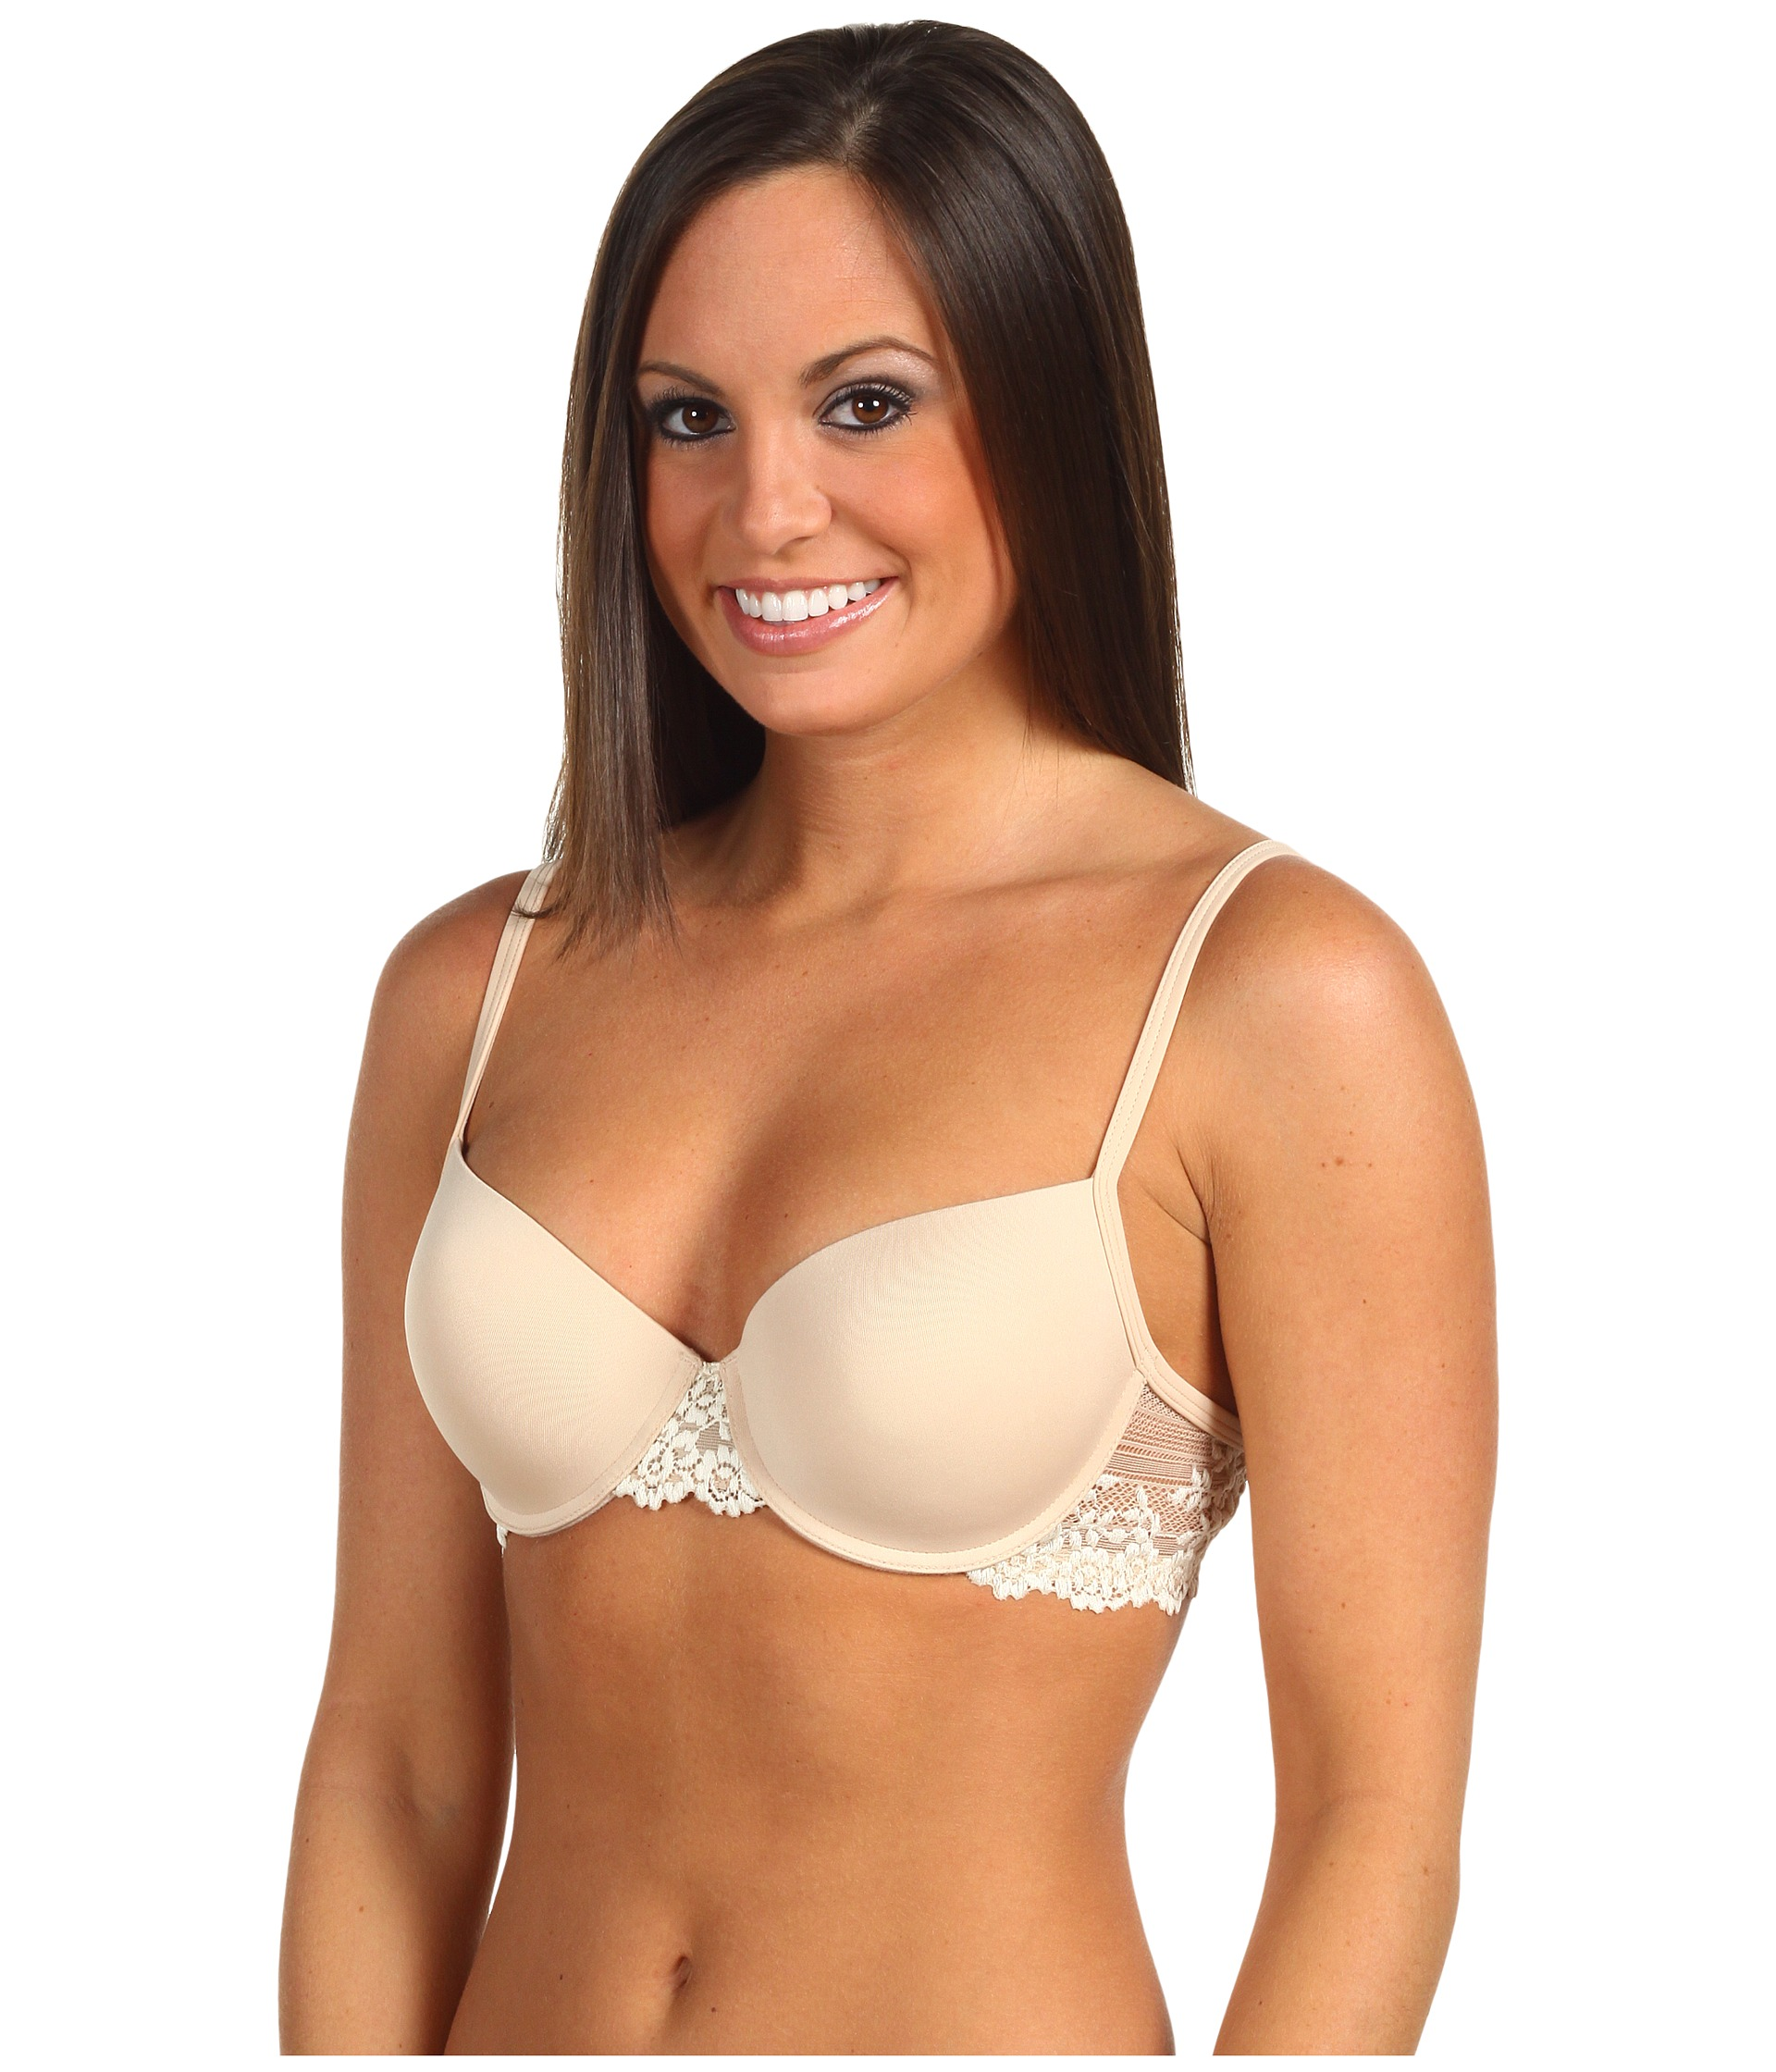 05edb7b4f8 Wacoal Petite Embrace Lace Push-Up Bra 75891 - Zappos.com Free .